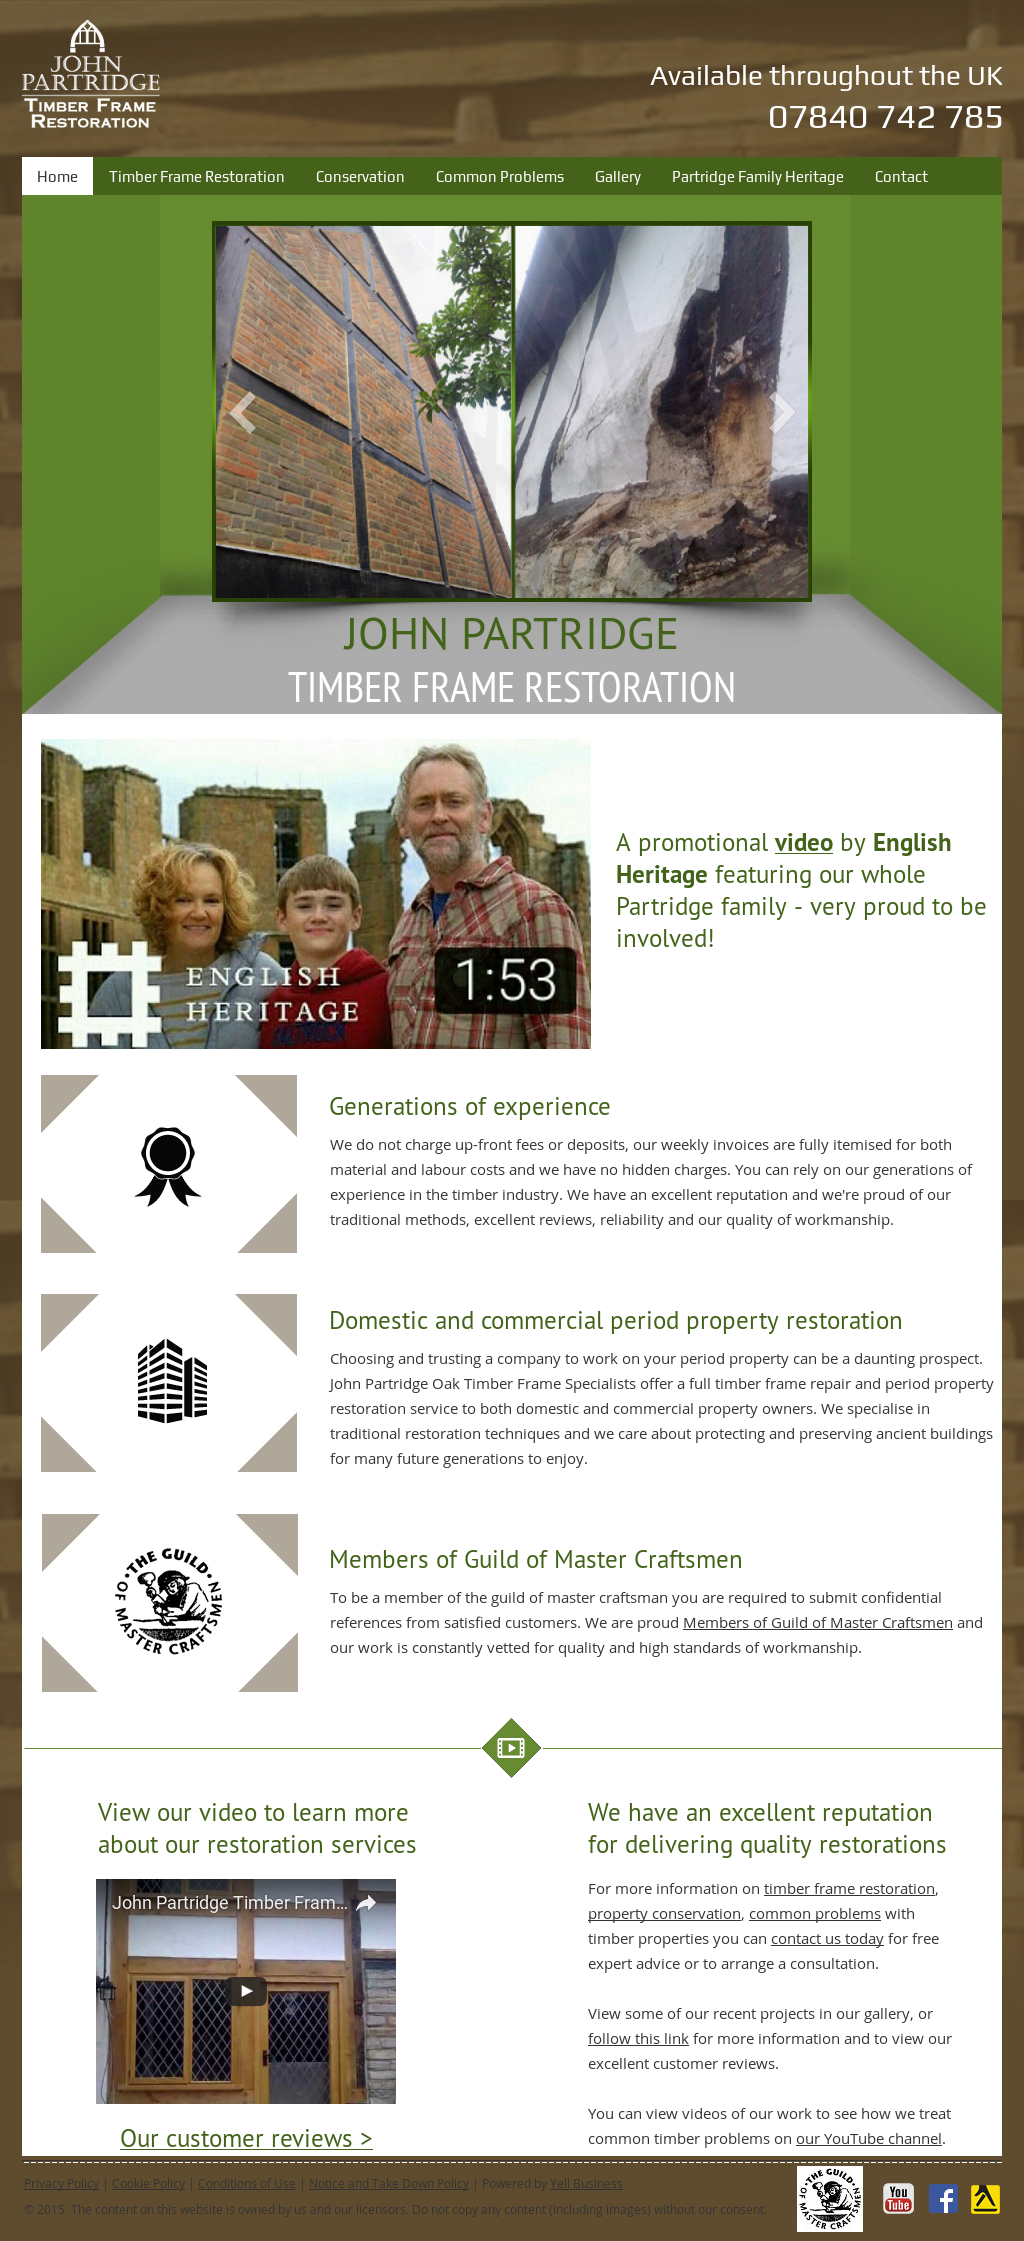 John Partridge - Timber Frame Restoration Competitors, Revenue and ...